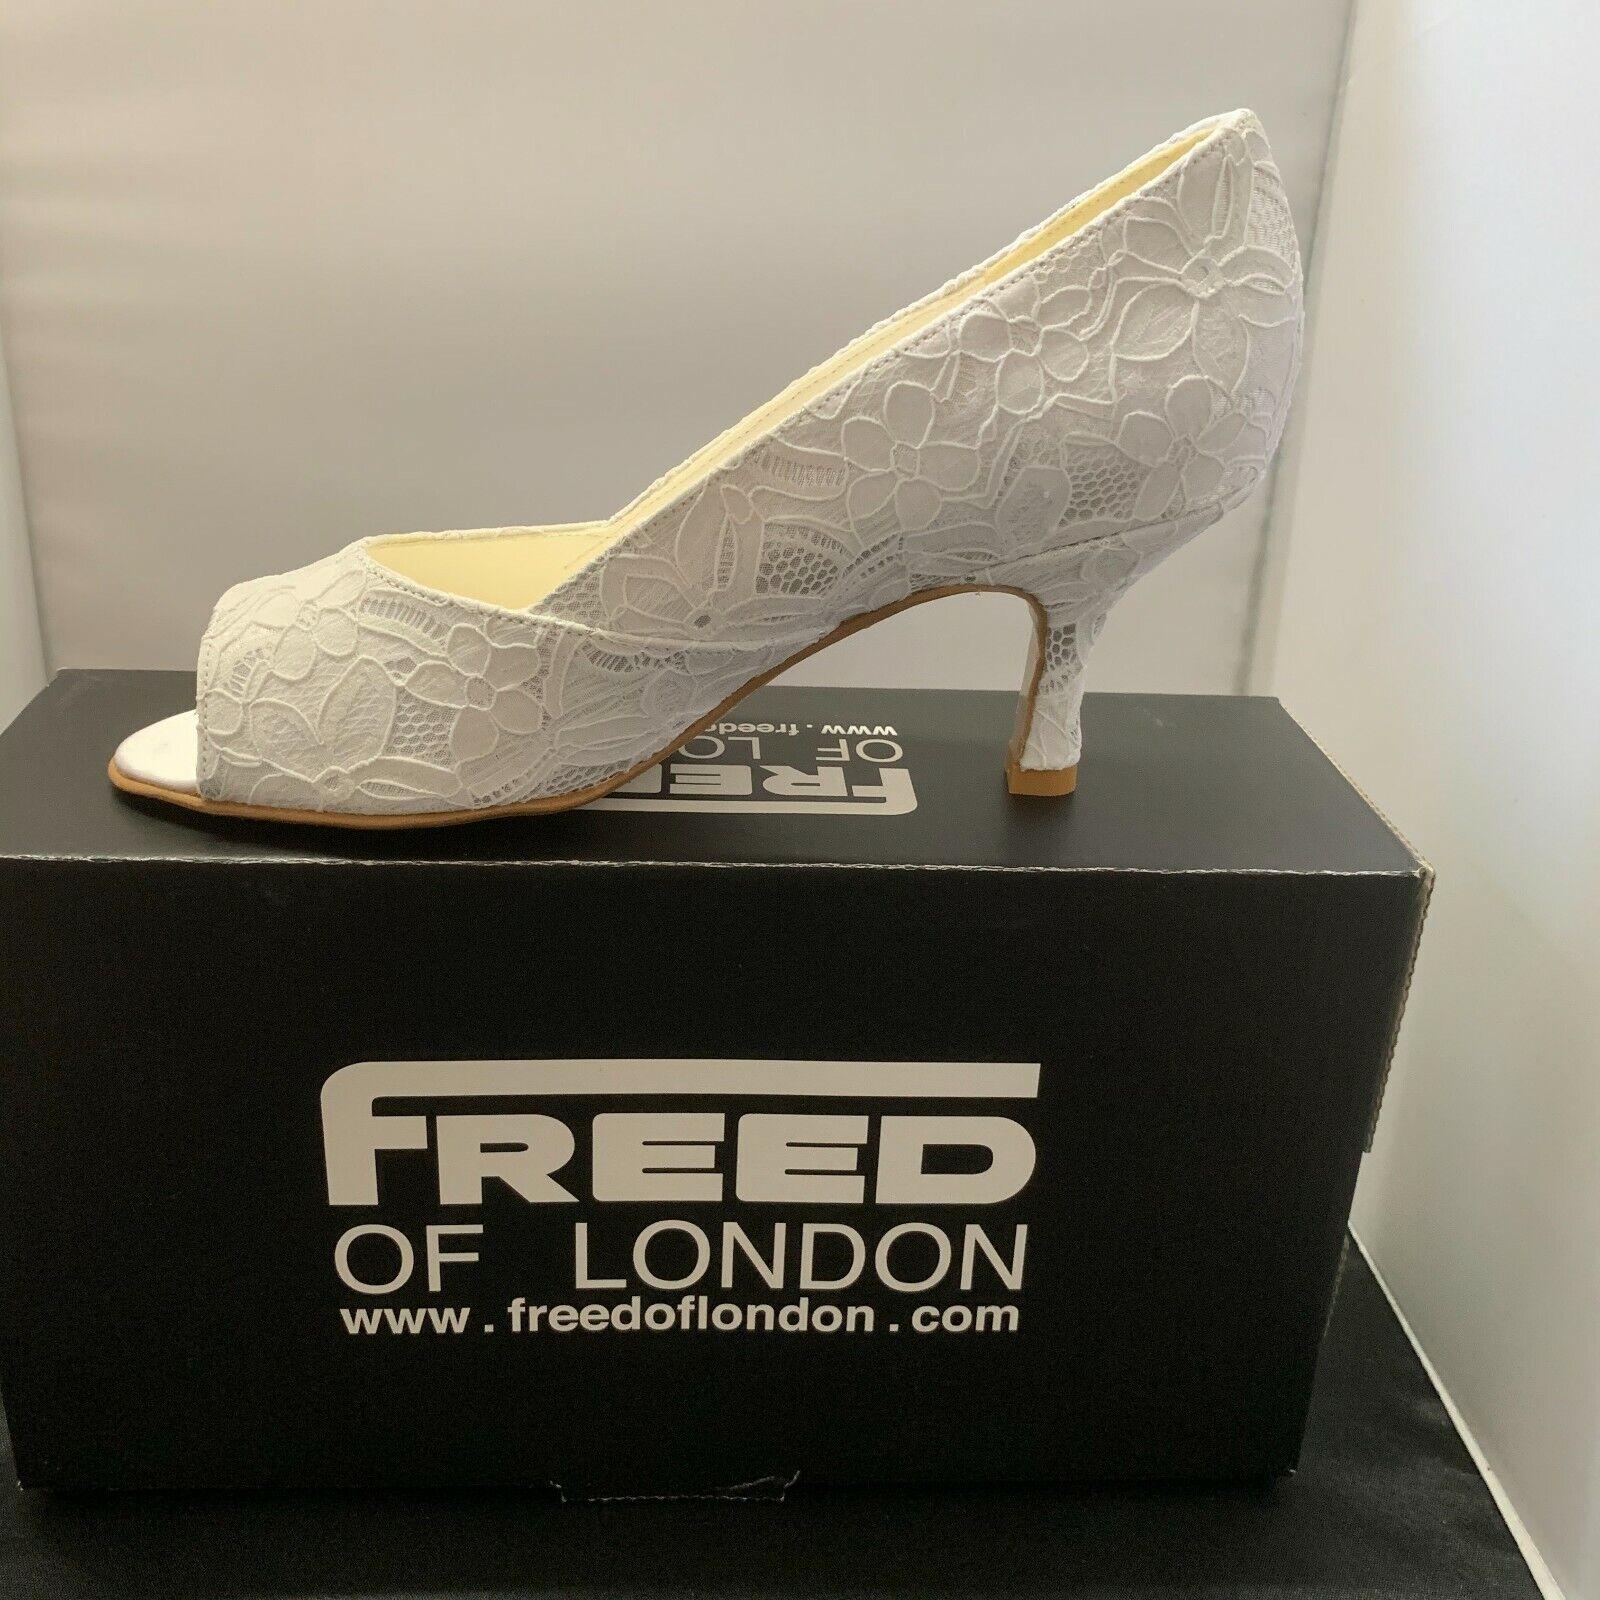 Ladies Bridal shoe, white lace size 5, 2.5 heel, by Freed of London UK.